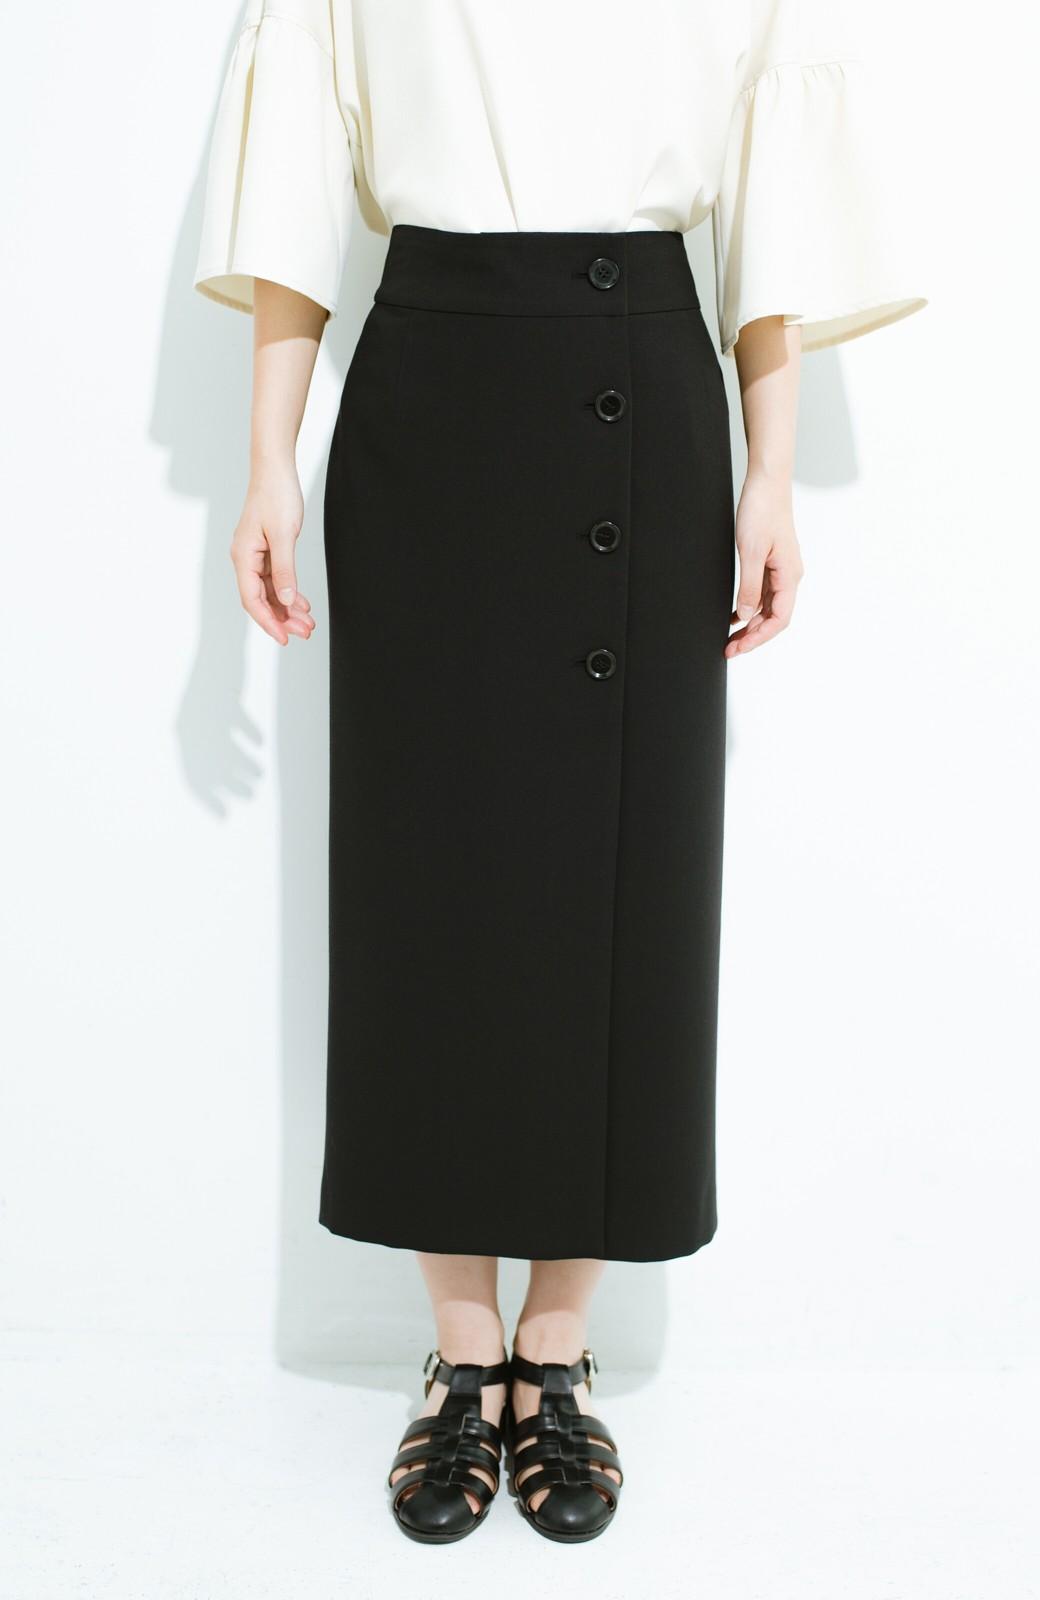 haco! はいてこそ見える実力、セミフォーマルにも使えるオトナのタイトスカート by MAKORI <ブラック>の商品写真3